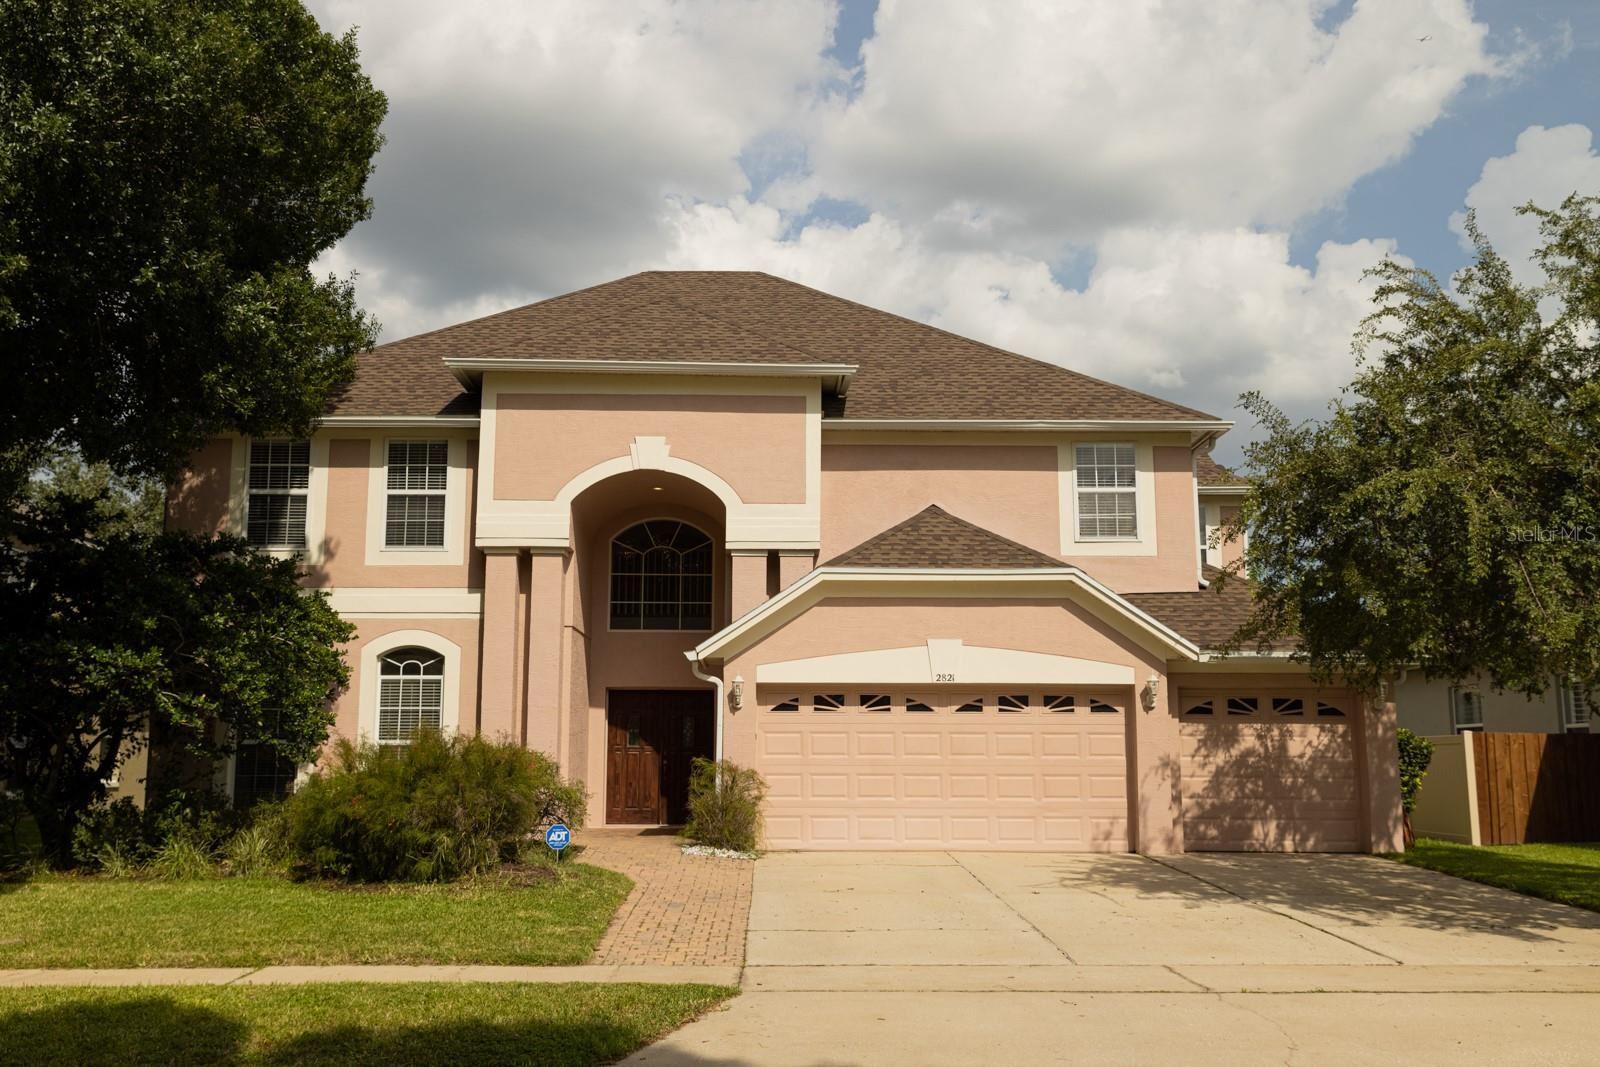 2821 UNIVERSITY ACRES DRIVE, Orlando, FL 32817 - #: G5046557